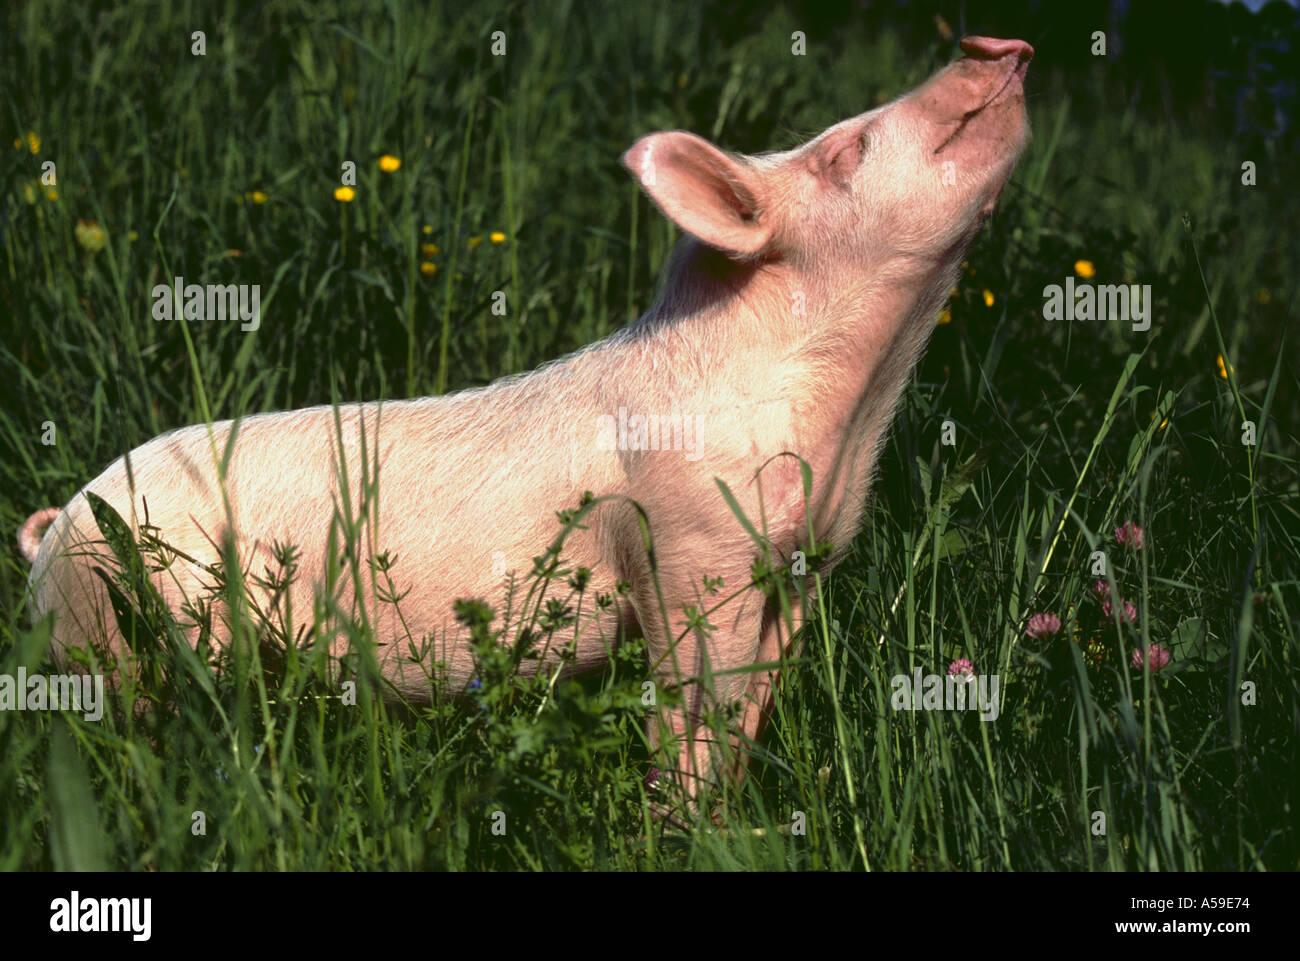 Lechón de cerdo joven animal animales criatura criaturas mamíferos mamíferos CERDOS cerdos LECHONES Lechones de granja de animales al aire libre Imagen De Stock